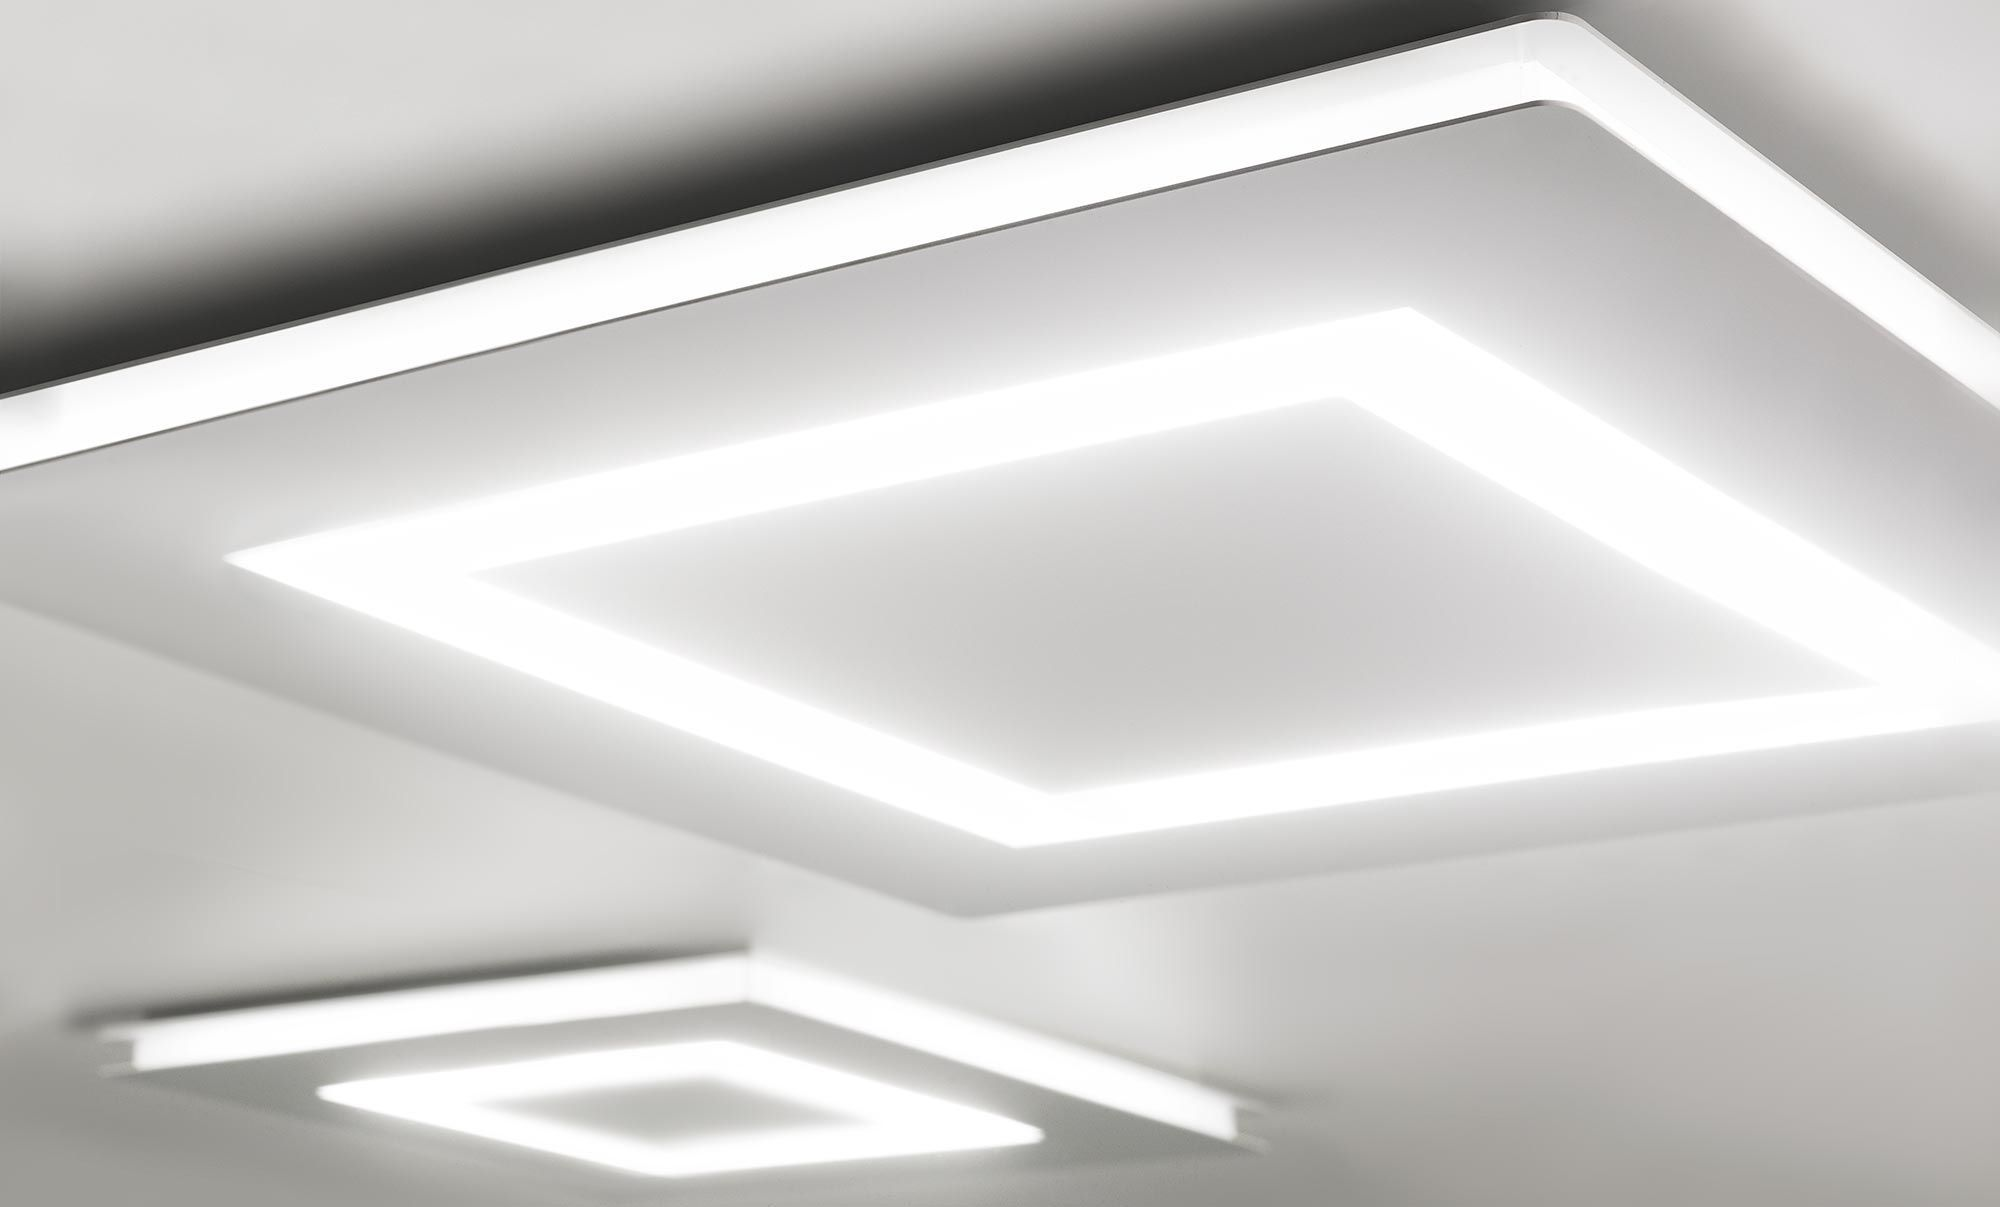 Plafoniera Per Esterno Quadrata : Plafoniera moderna quadrata in metallo policarbonato